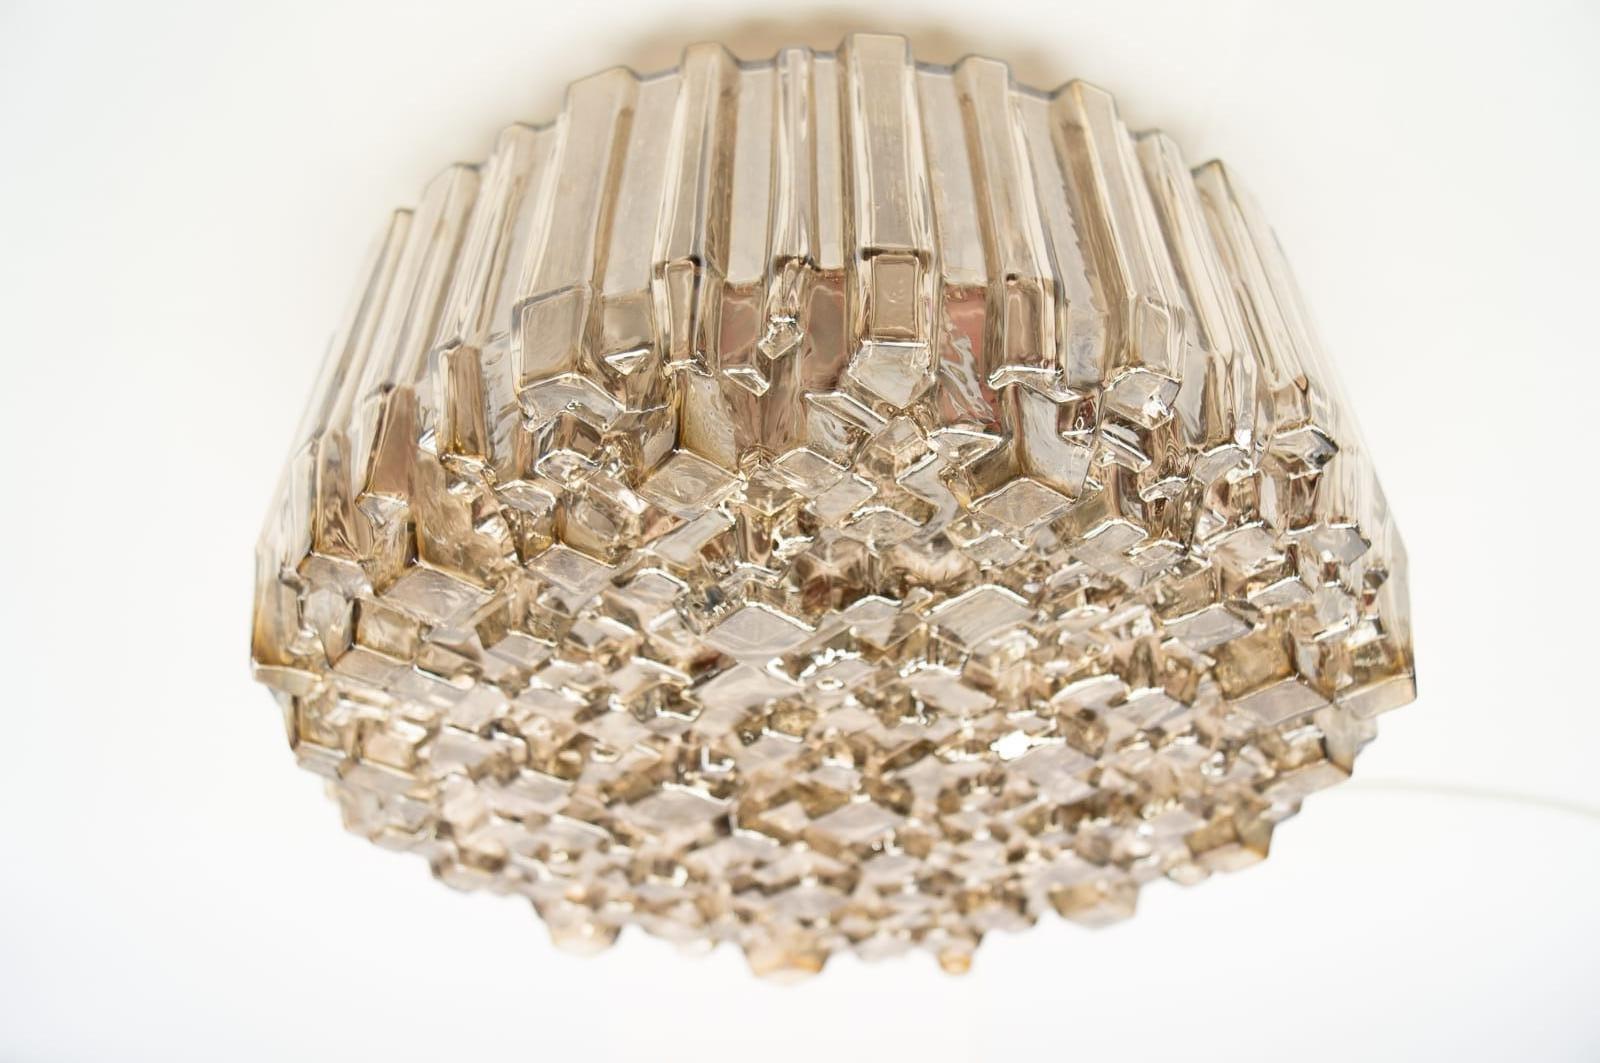 vintage ceiling lighting. Vintage Textured Glass Wall Or Ceiling Light 1960s Set Of 3 Lighting